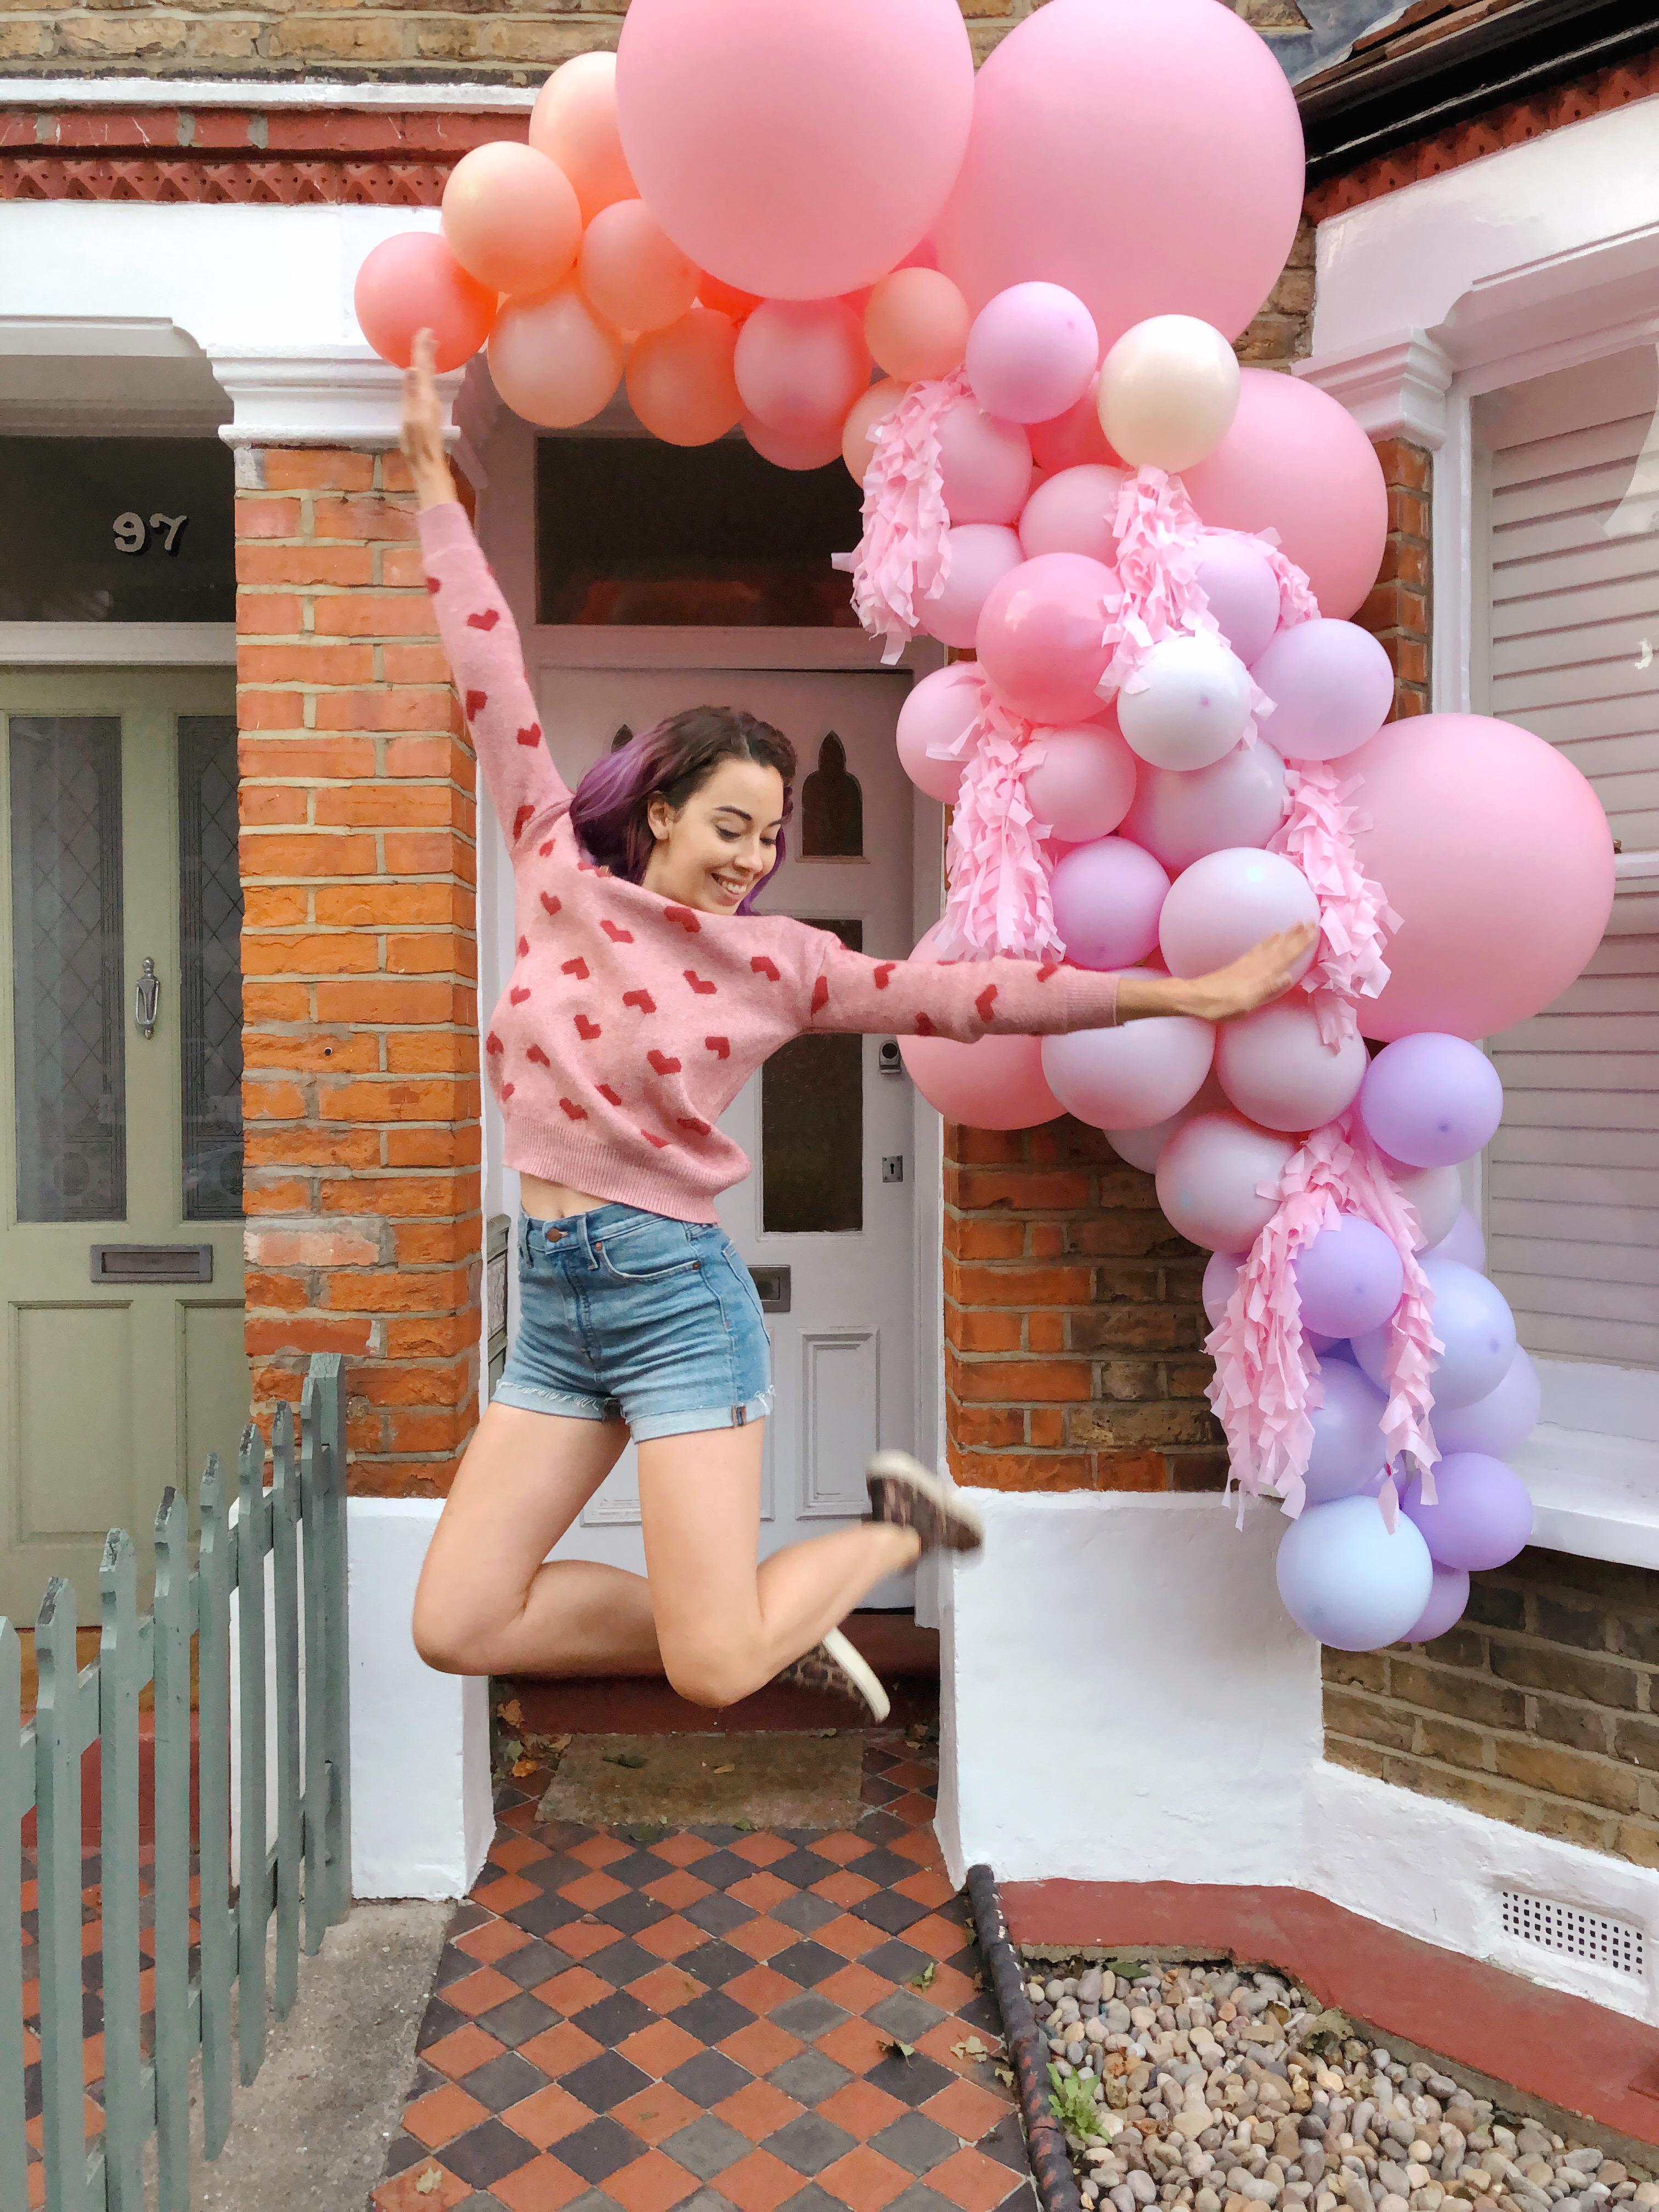 Balloon garland with Kelly jumping - art installation